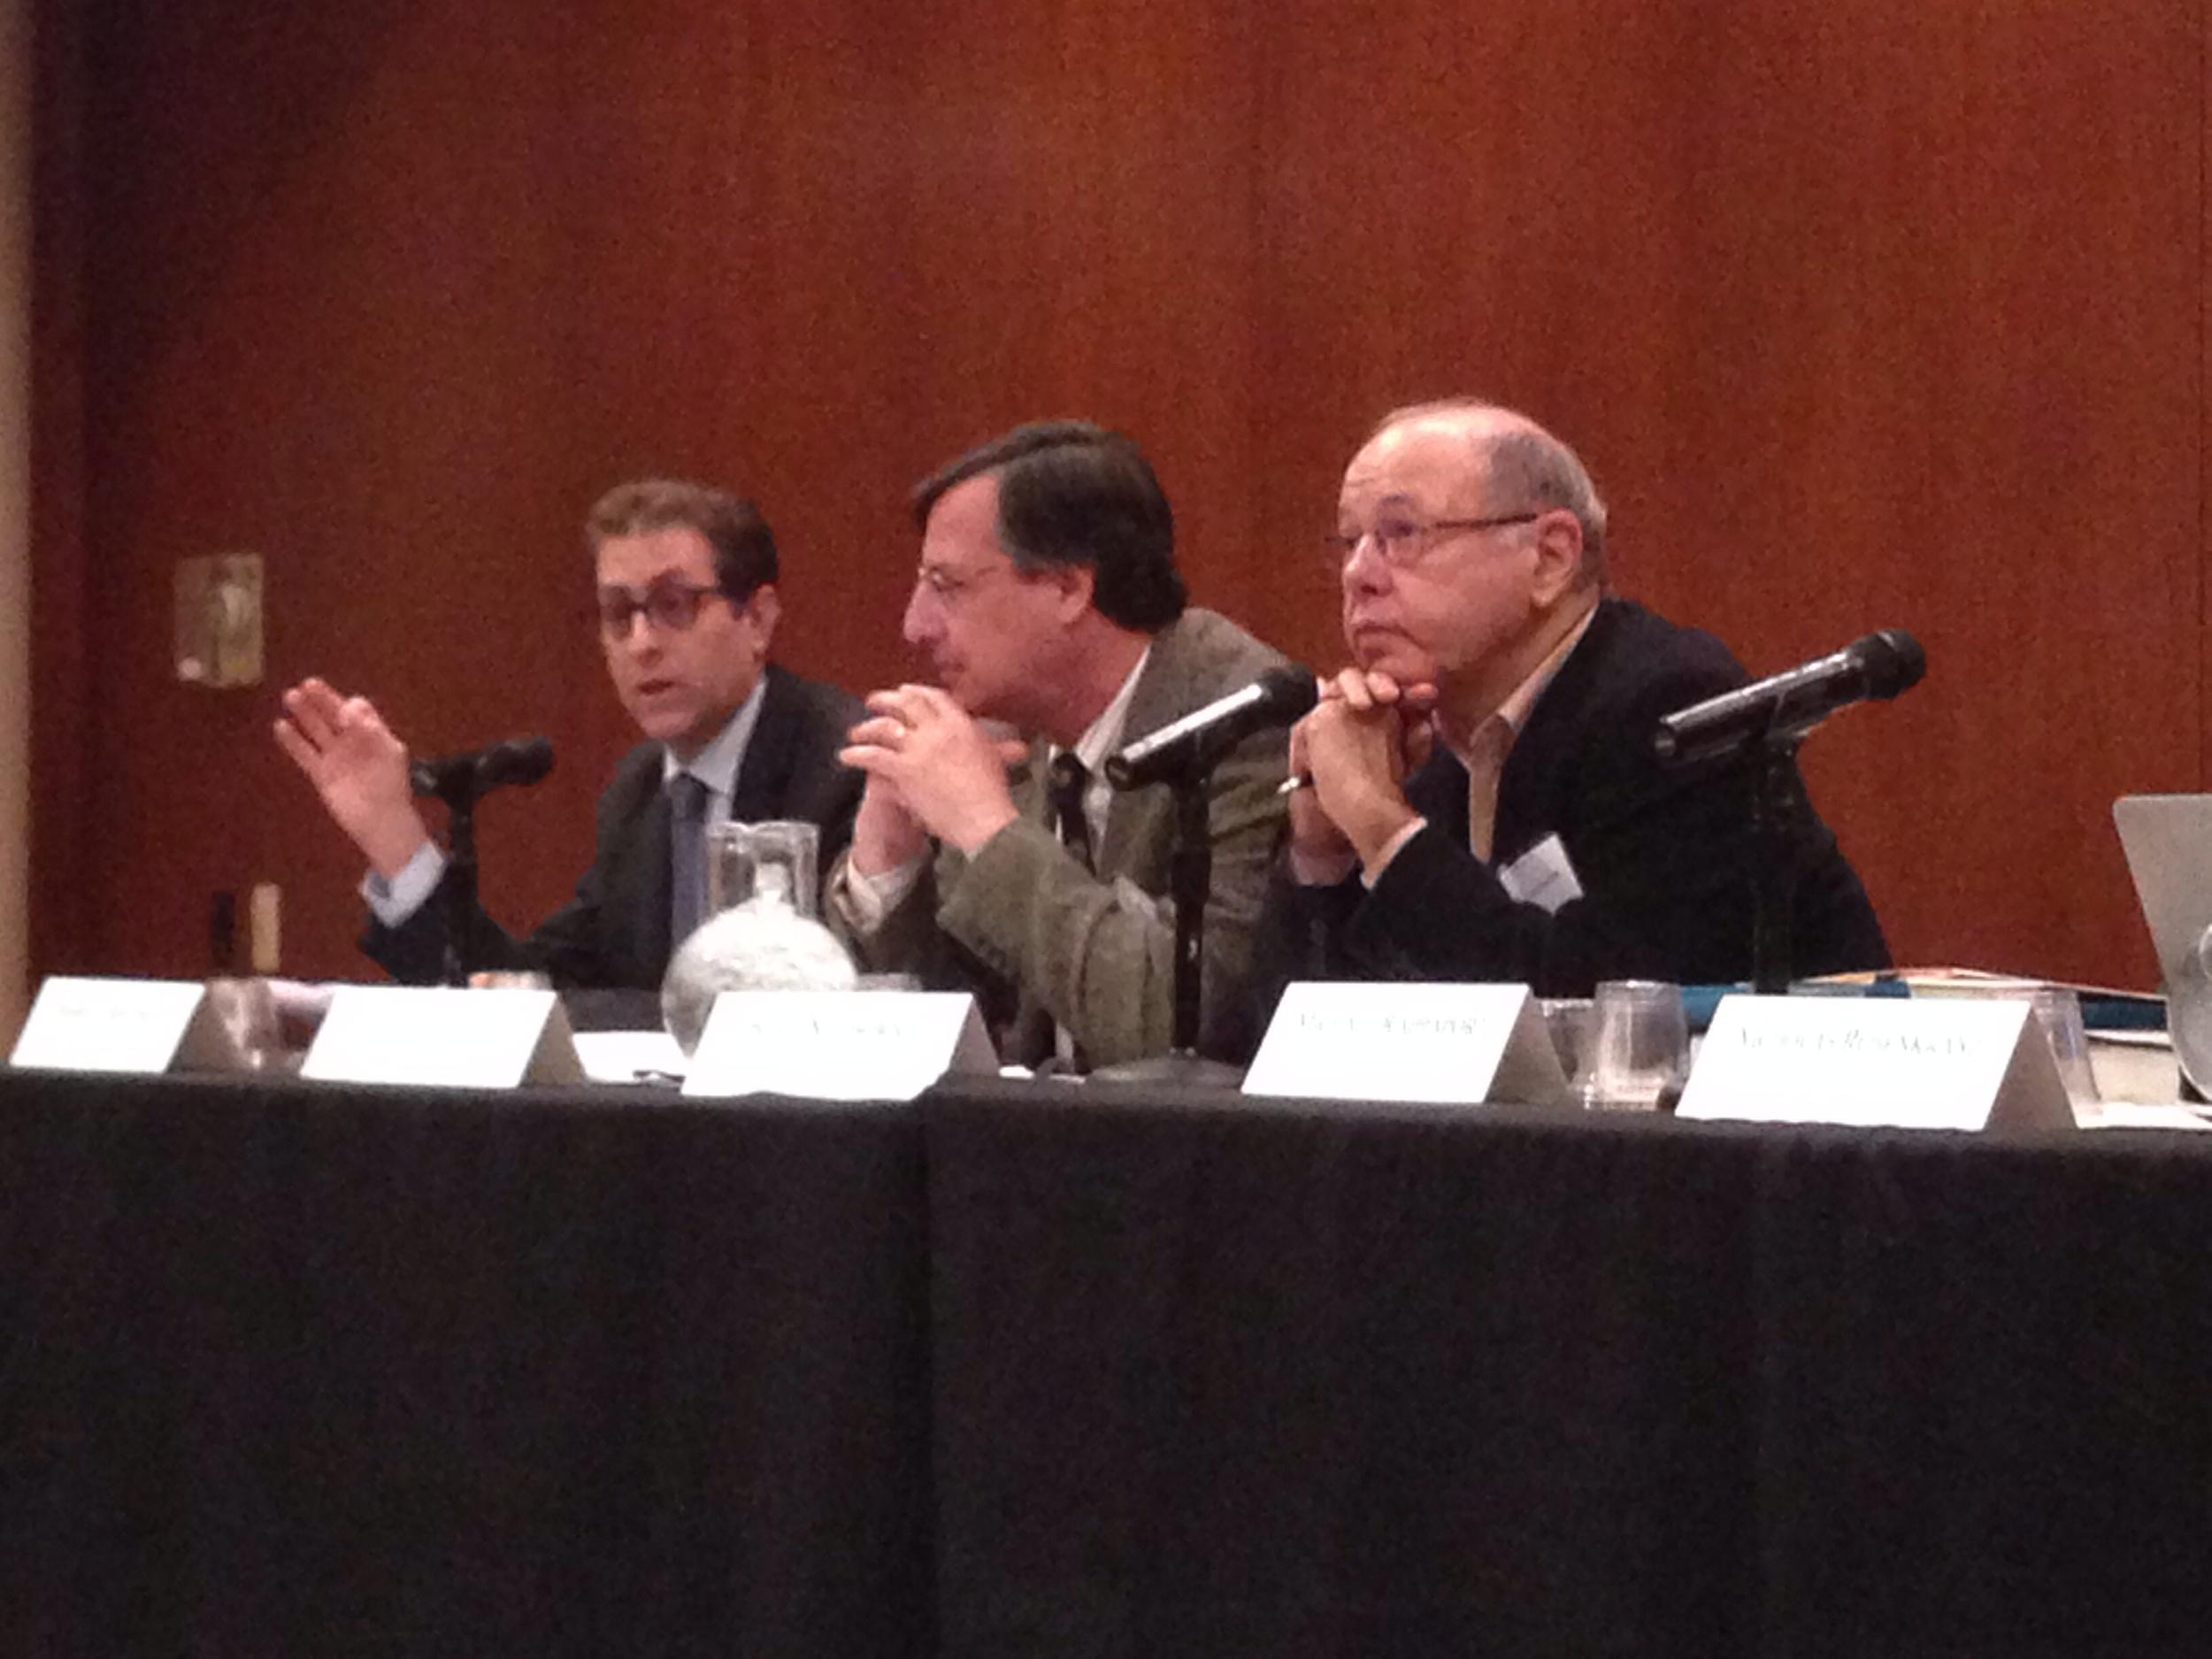 Barry Friedman, Gary Lawson, Burt Neuborne (from left to right)